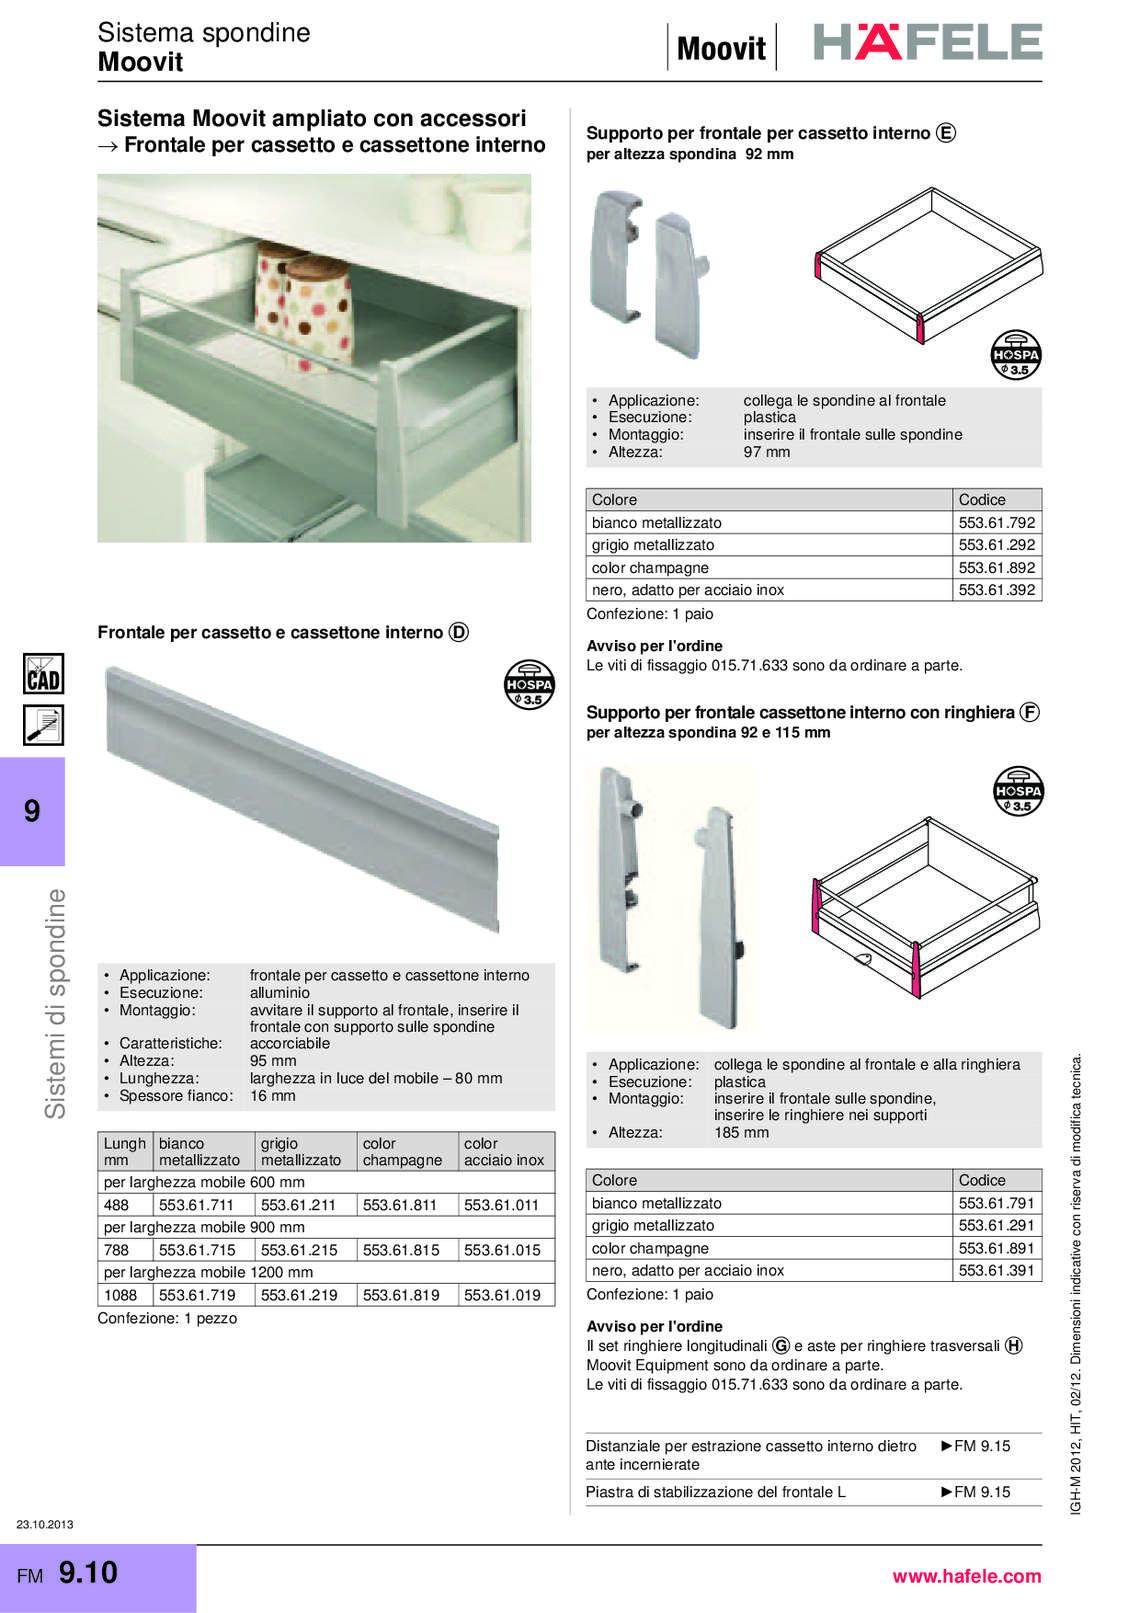 hafele-spondine-e-guide-per-mobili_40_021.jpg